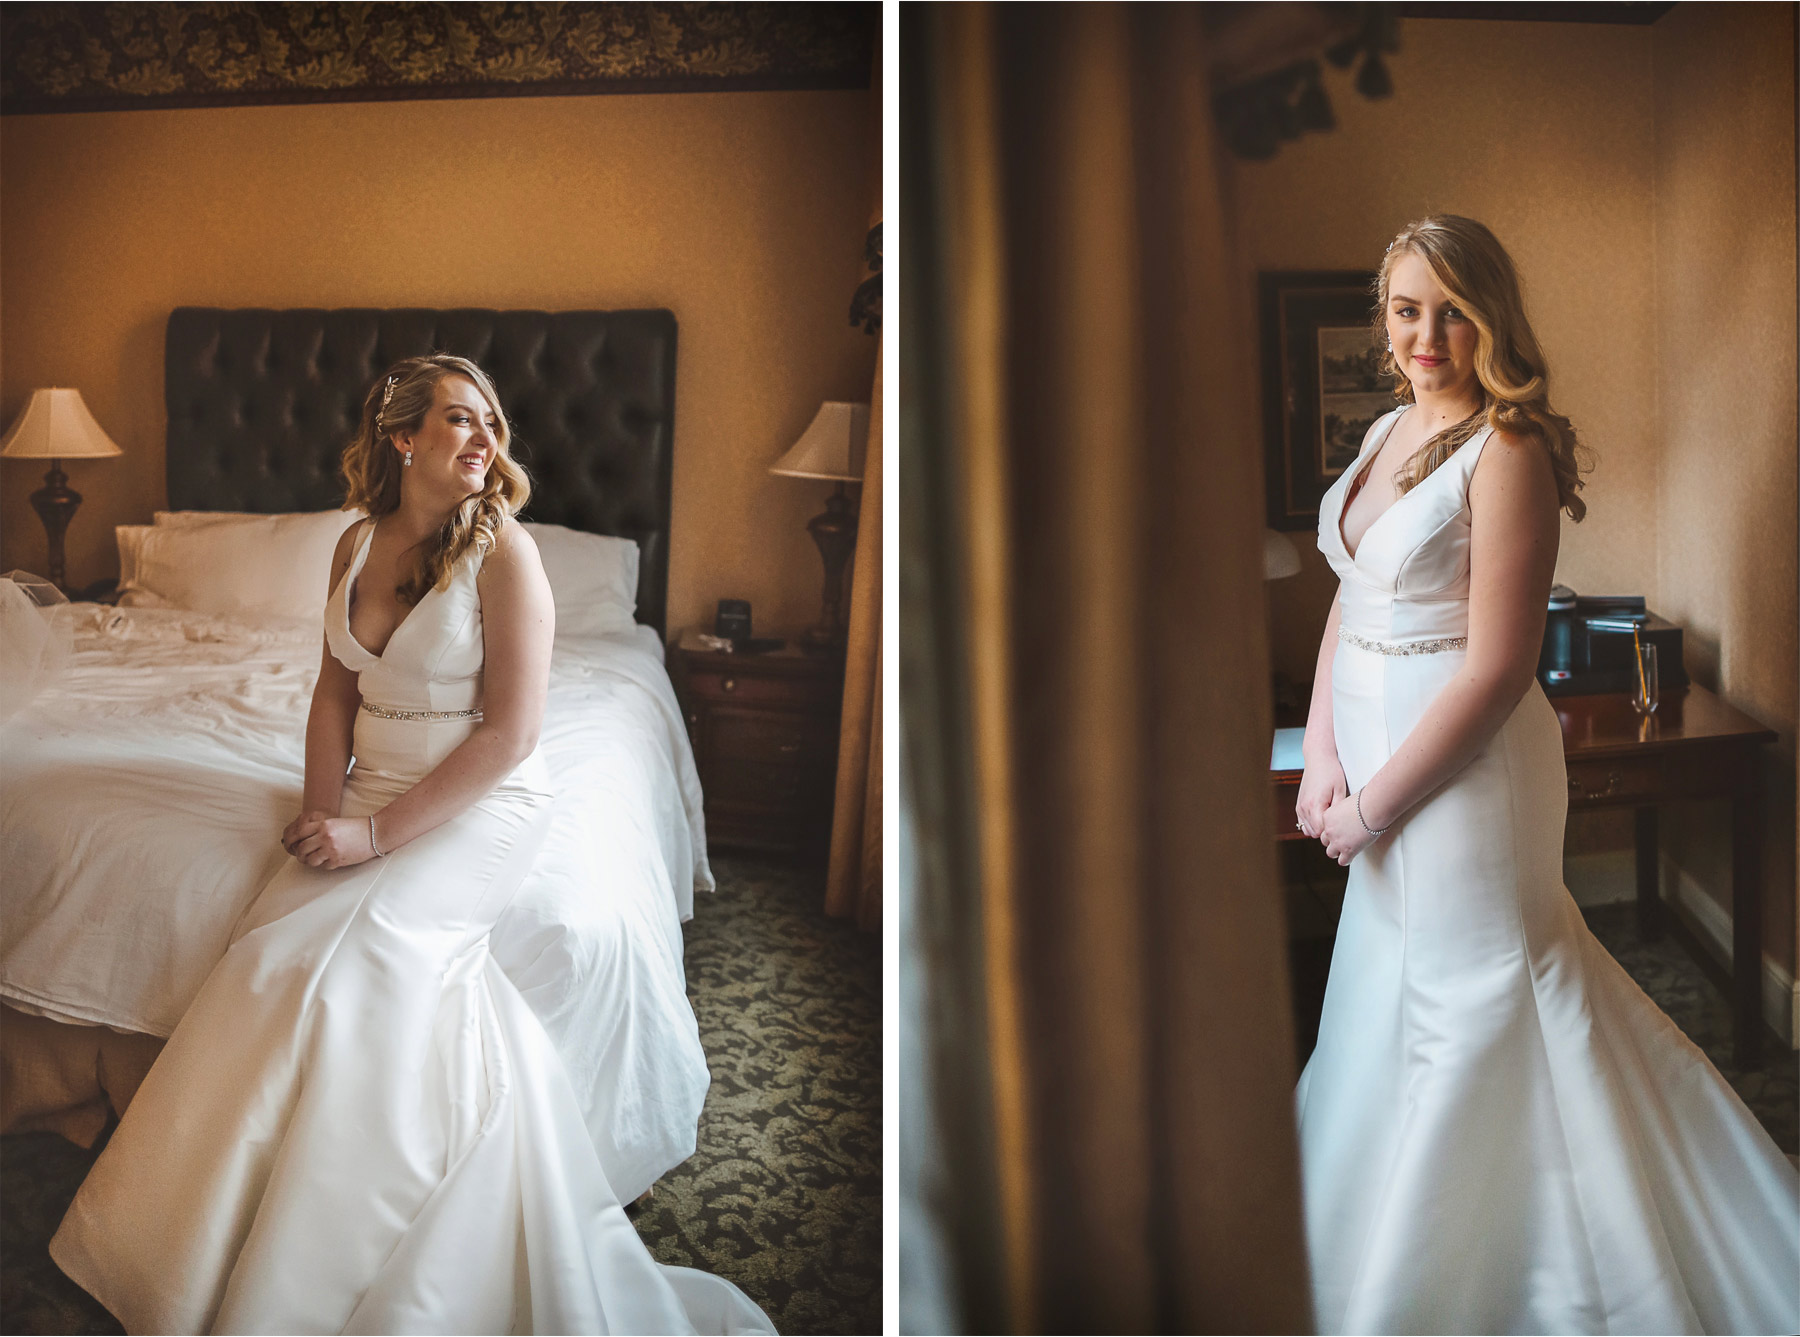 03-Minneapolis-Minnesota-Wedding-Vick-Photography-The-Depot-Bride-Dress-Hotel-Amelia-and-Alexander.jpg